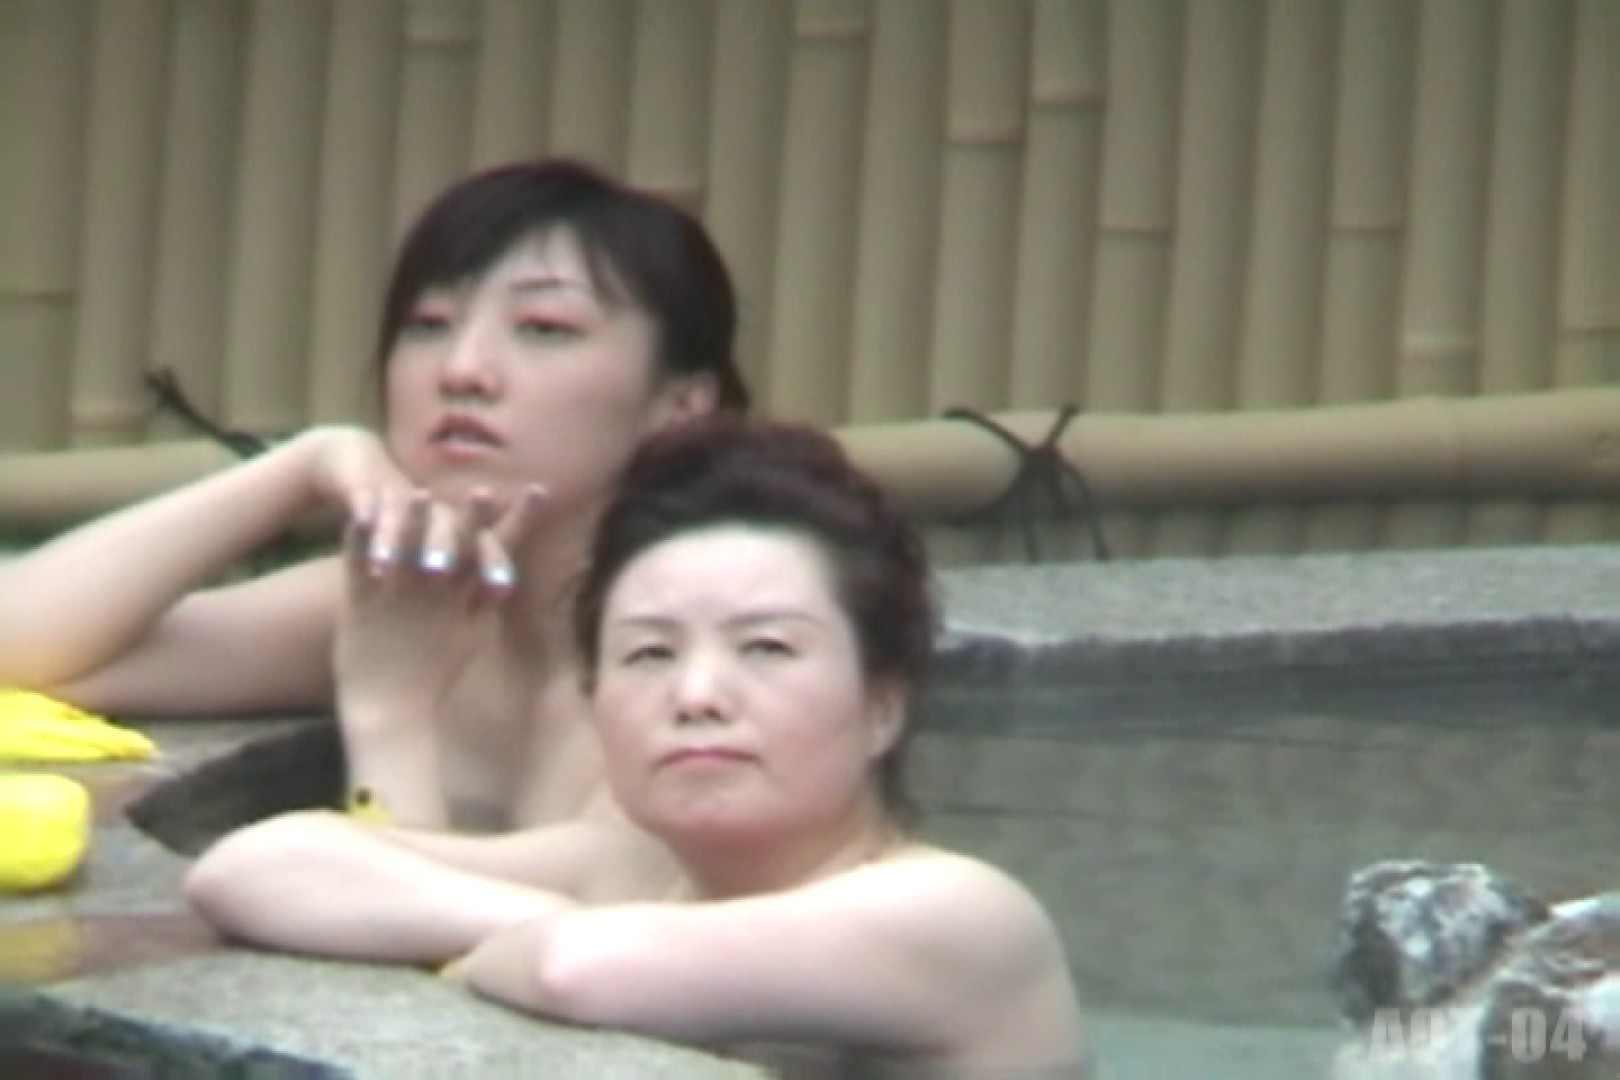 Aquaな露天風呂Vol.743 美しいOLの裸体 | 露天風呂突入  91pic 76